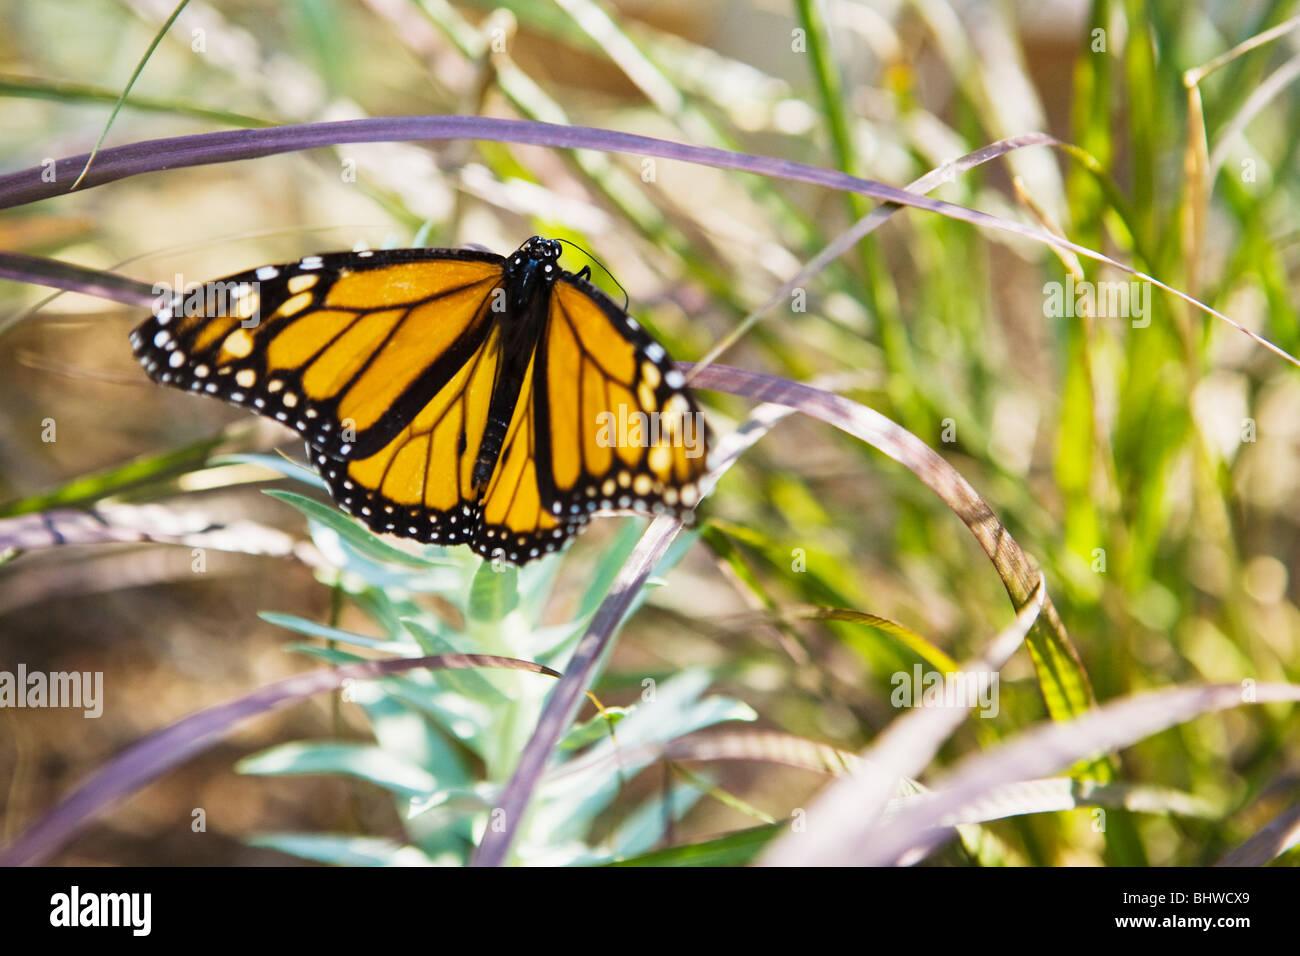 A Monarch Butterfly perched on a tree, Phoenix, Arizona, USA. - Stock Image